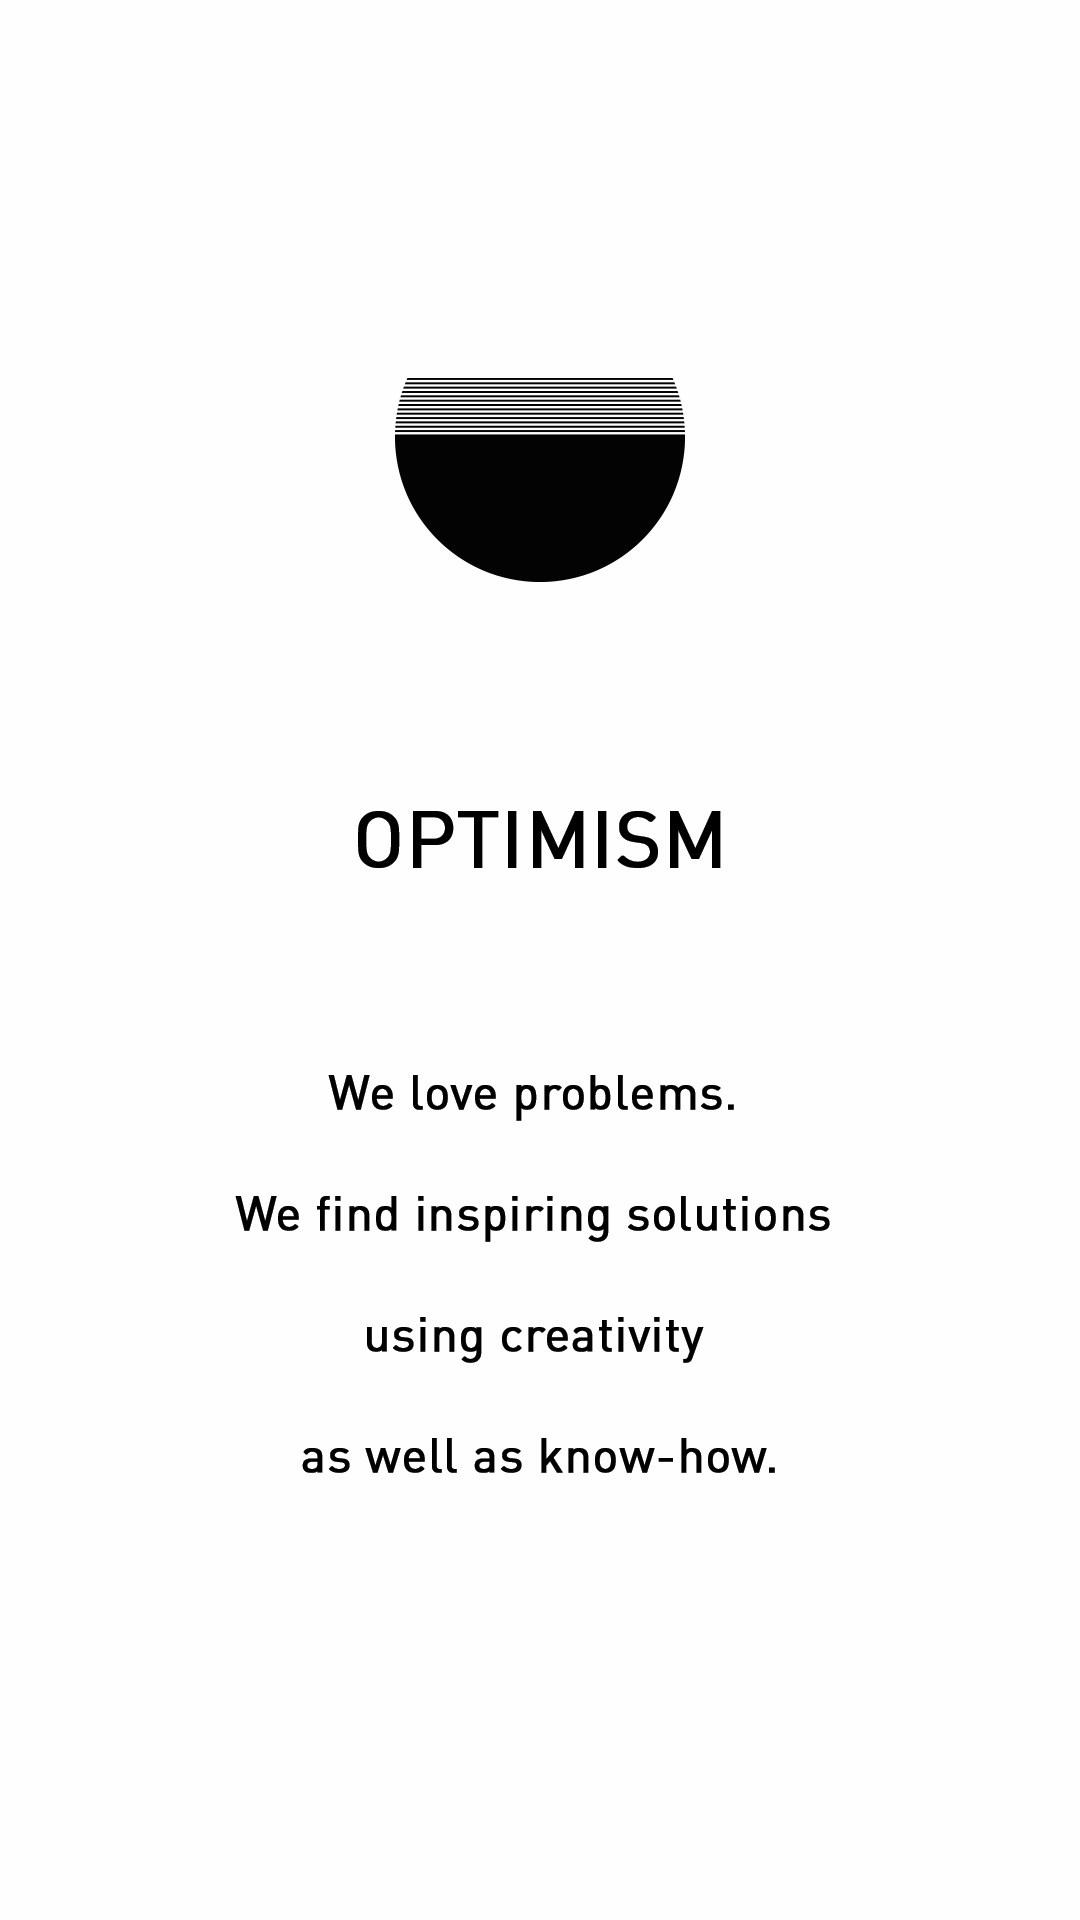 Entwurfreich Core Value Optimism